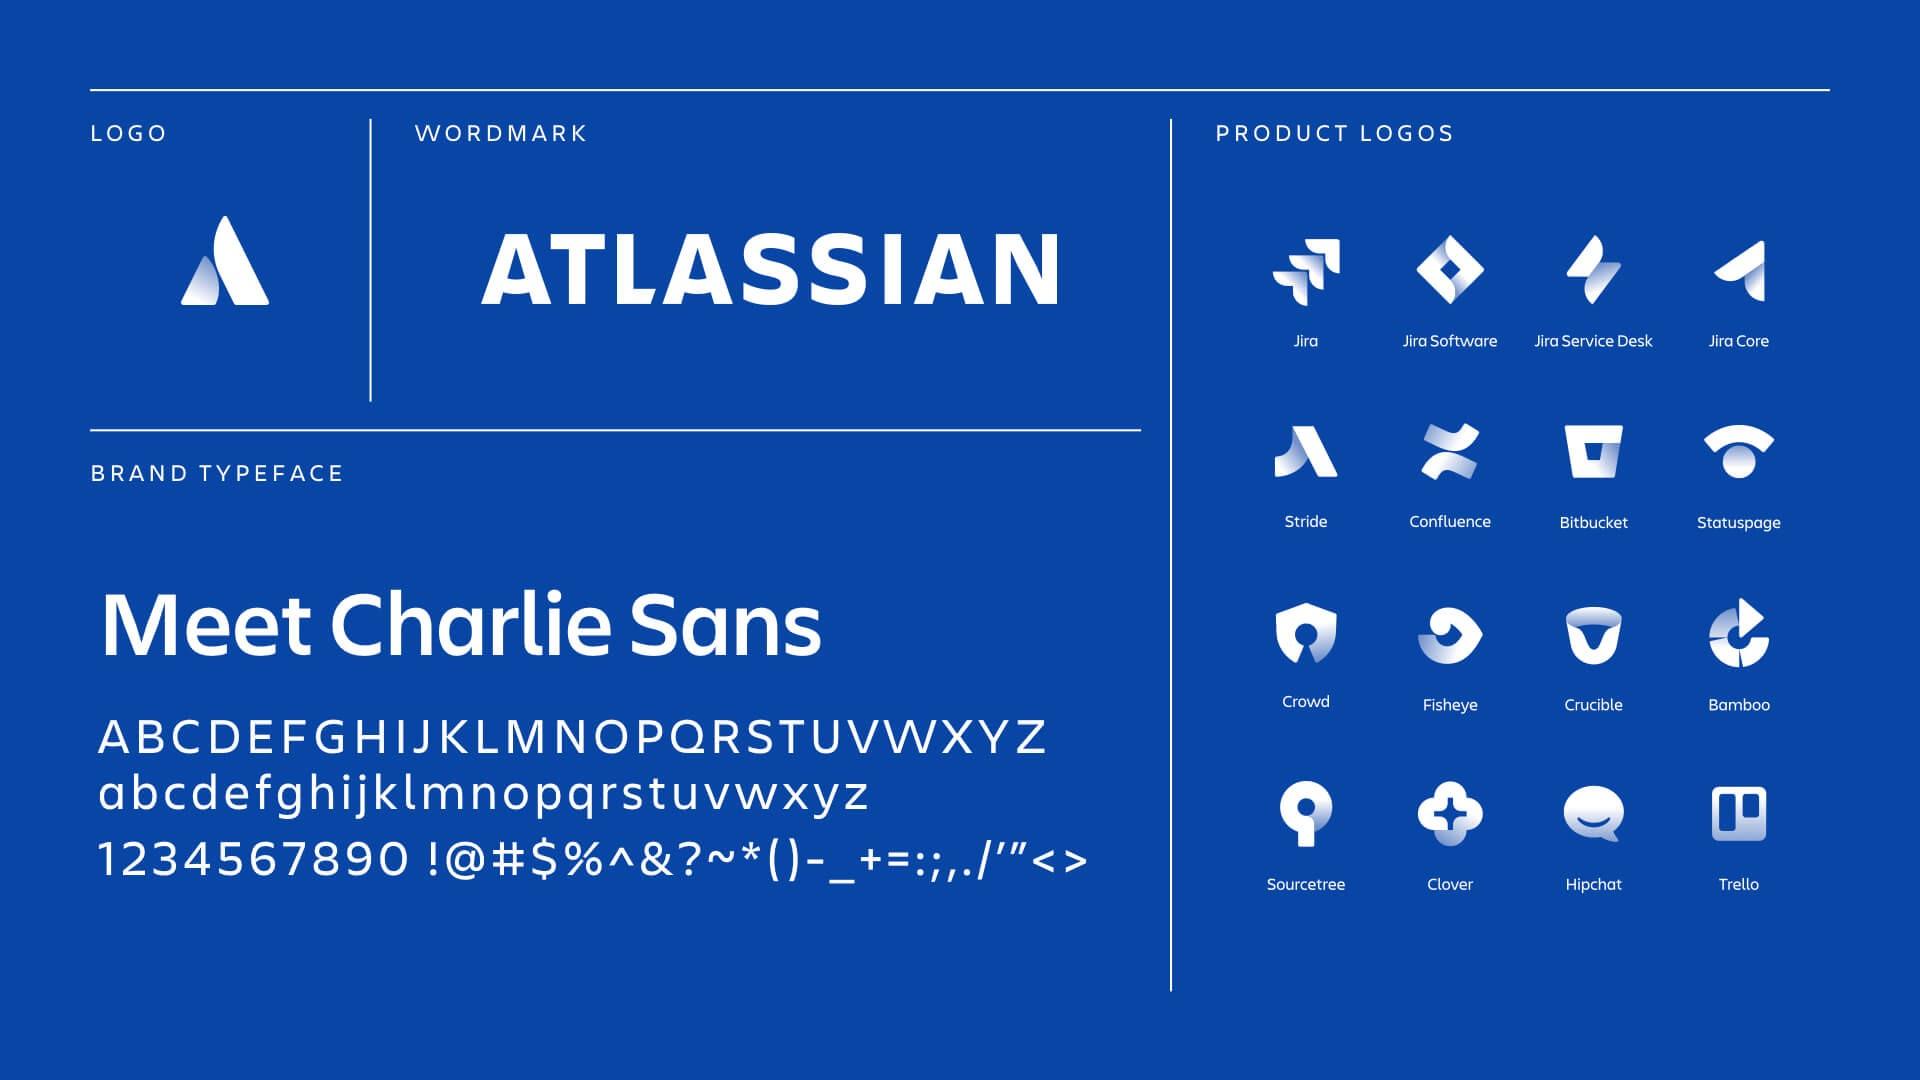 Atlassian's Current 'Branded House' (source: https://medium.com/designing-atlassian/behind-the-scenes-of-the-atlassian-rebrand-f6ba1592377e)